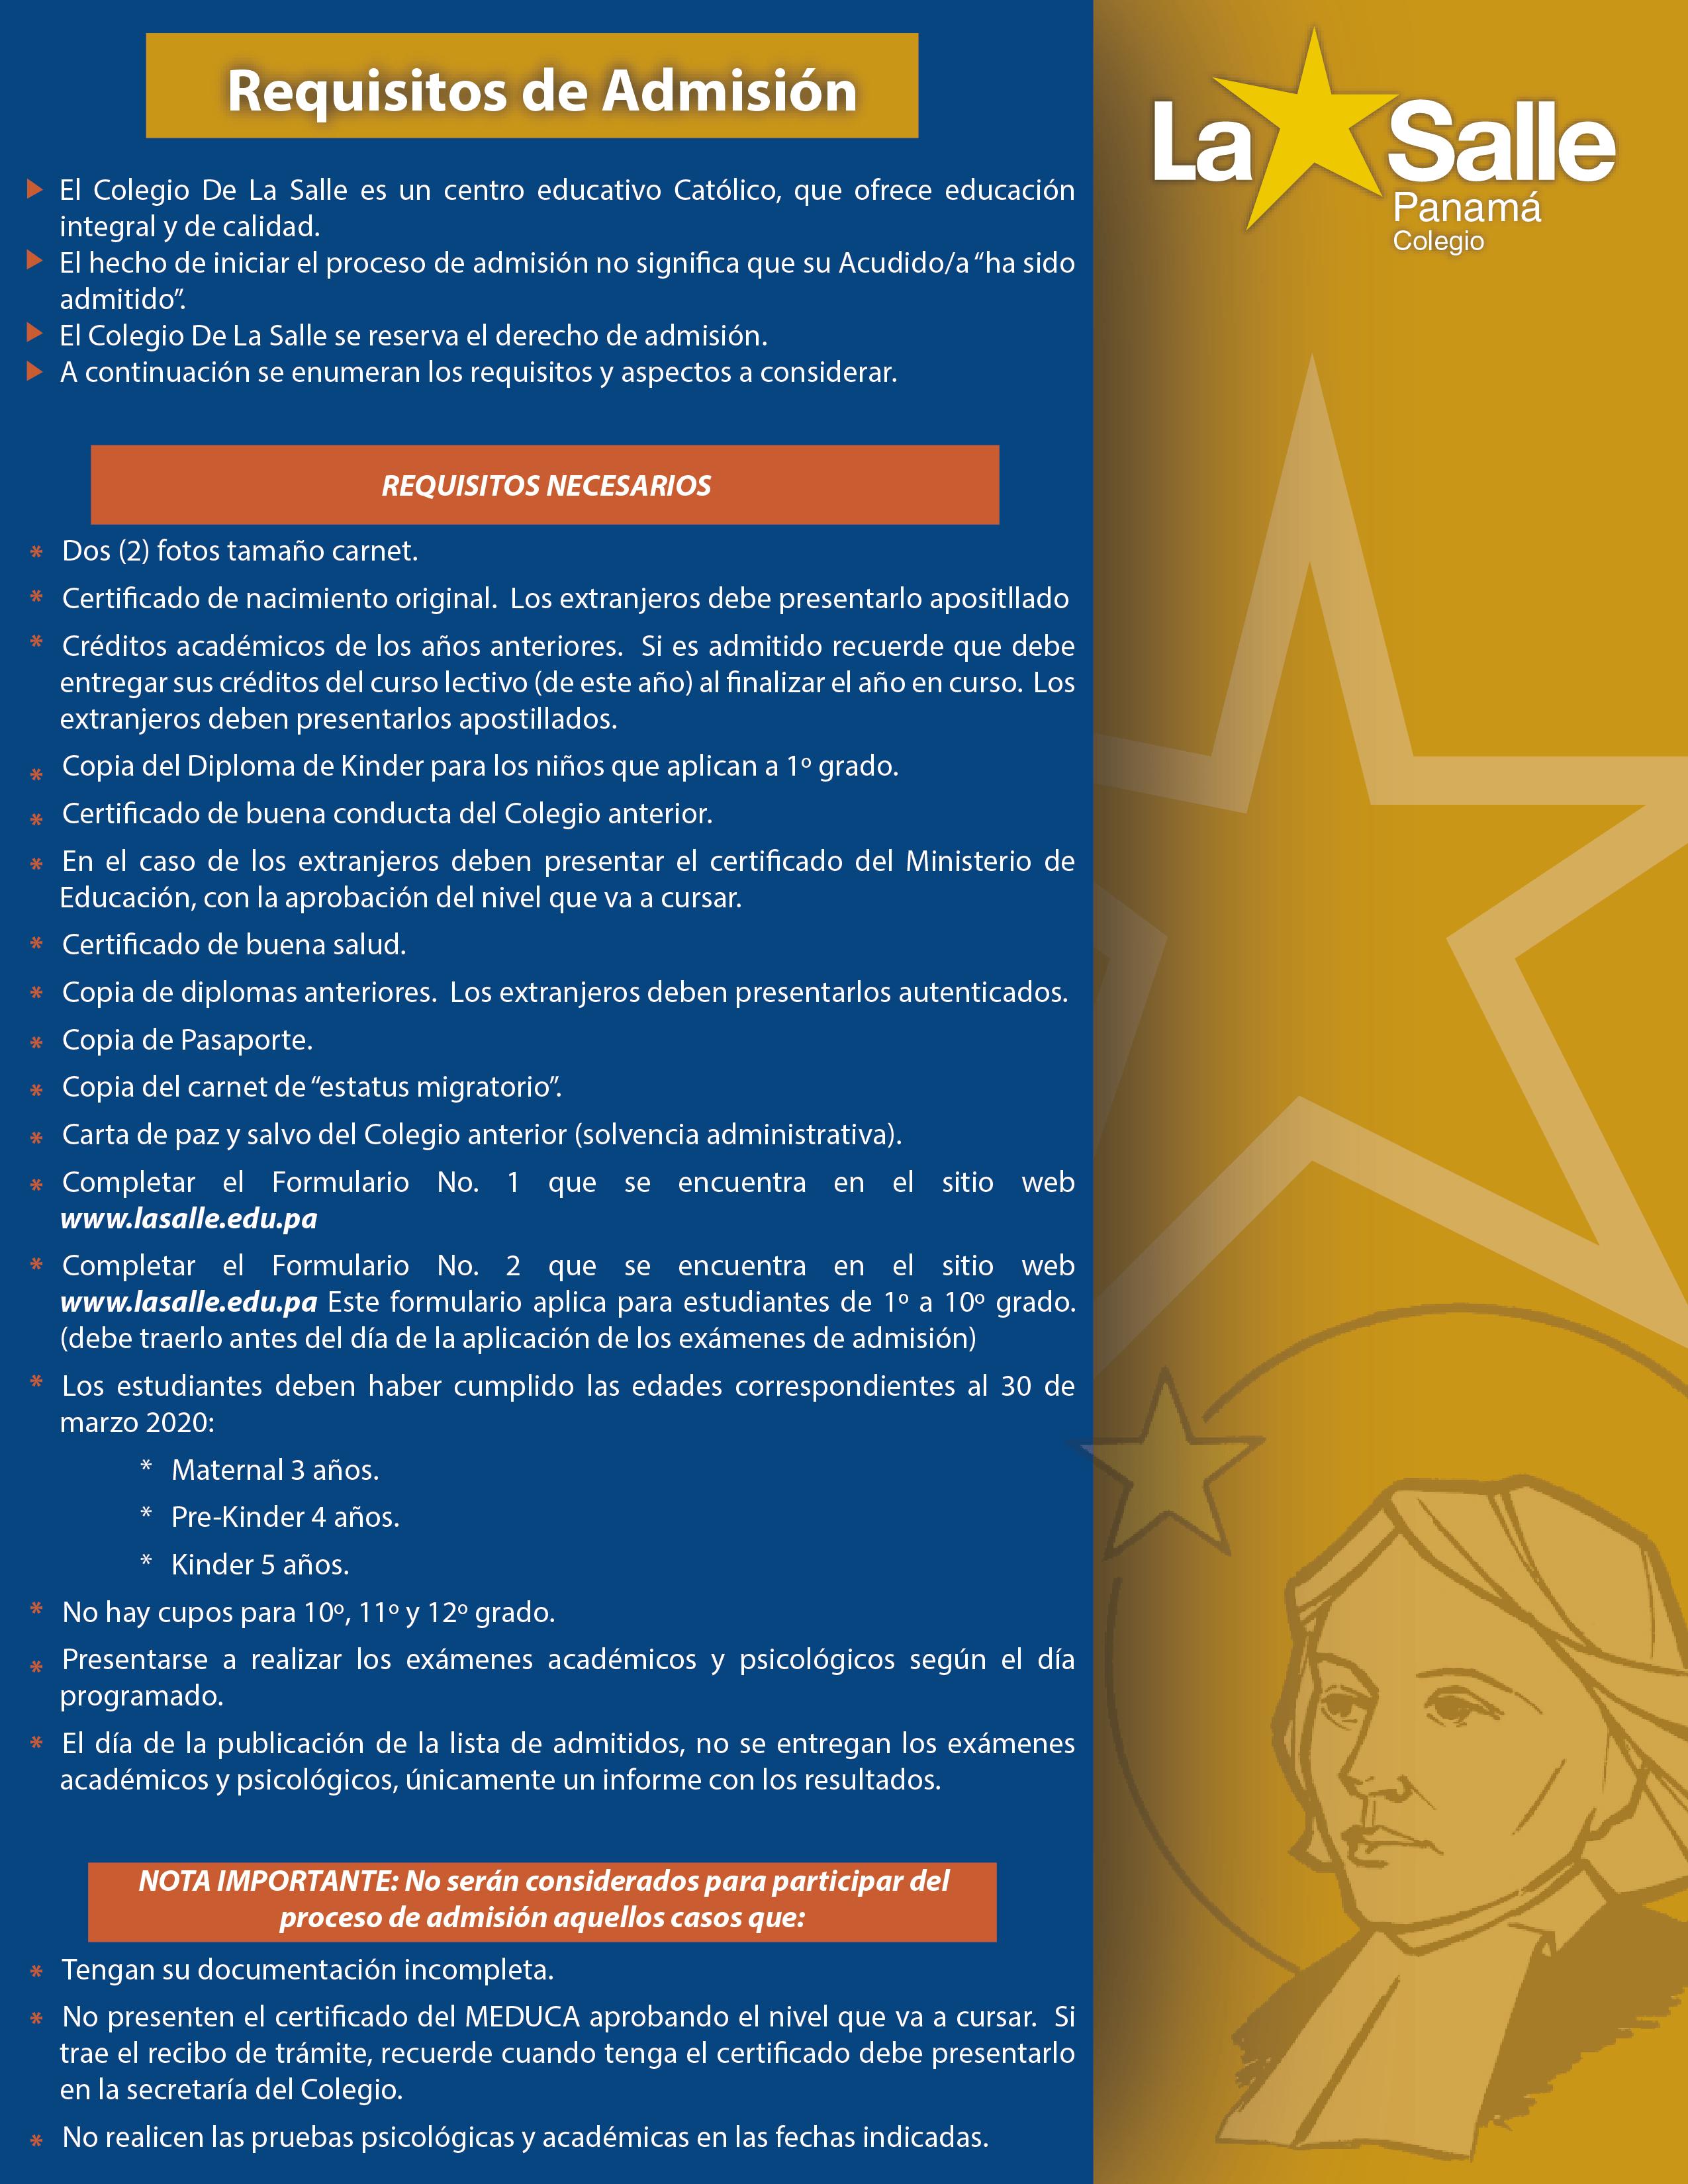 Calendario Escolar 2020 Panama Meduca.Admision Alumnos De Primer Ingreso